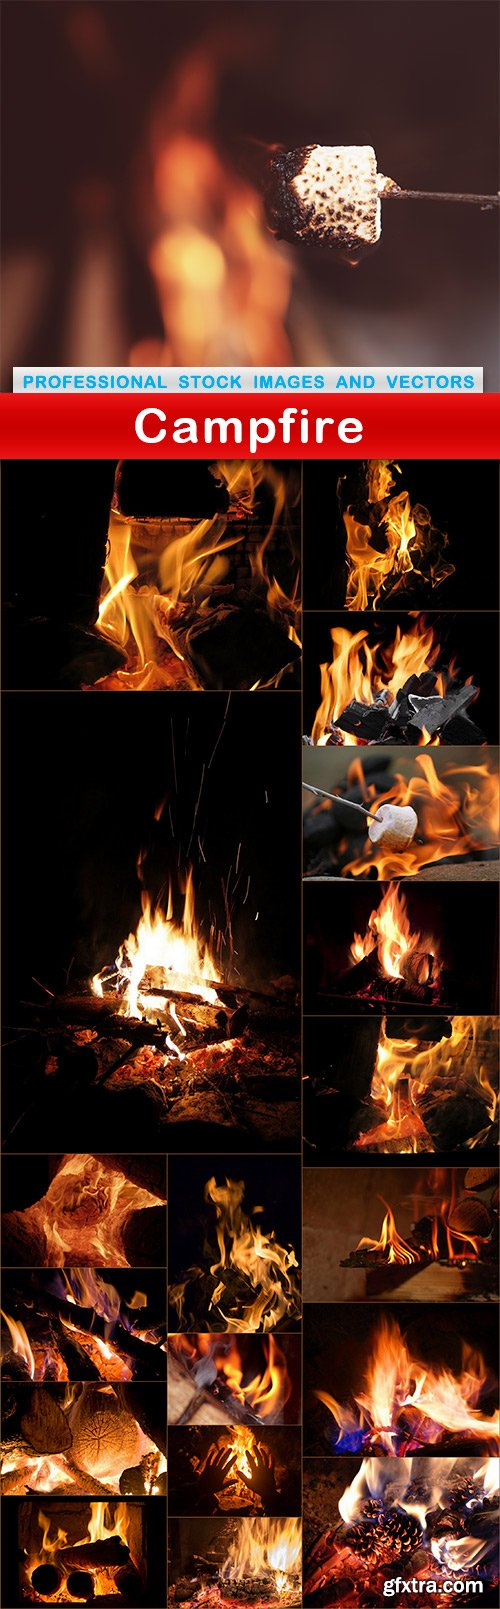 Campfire - 19 UHQ JPEG